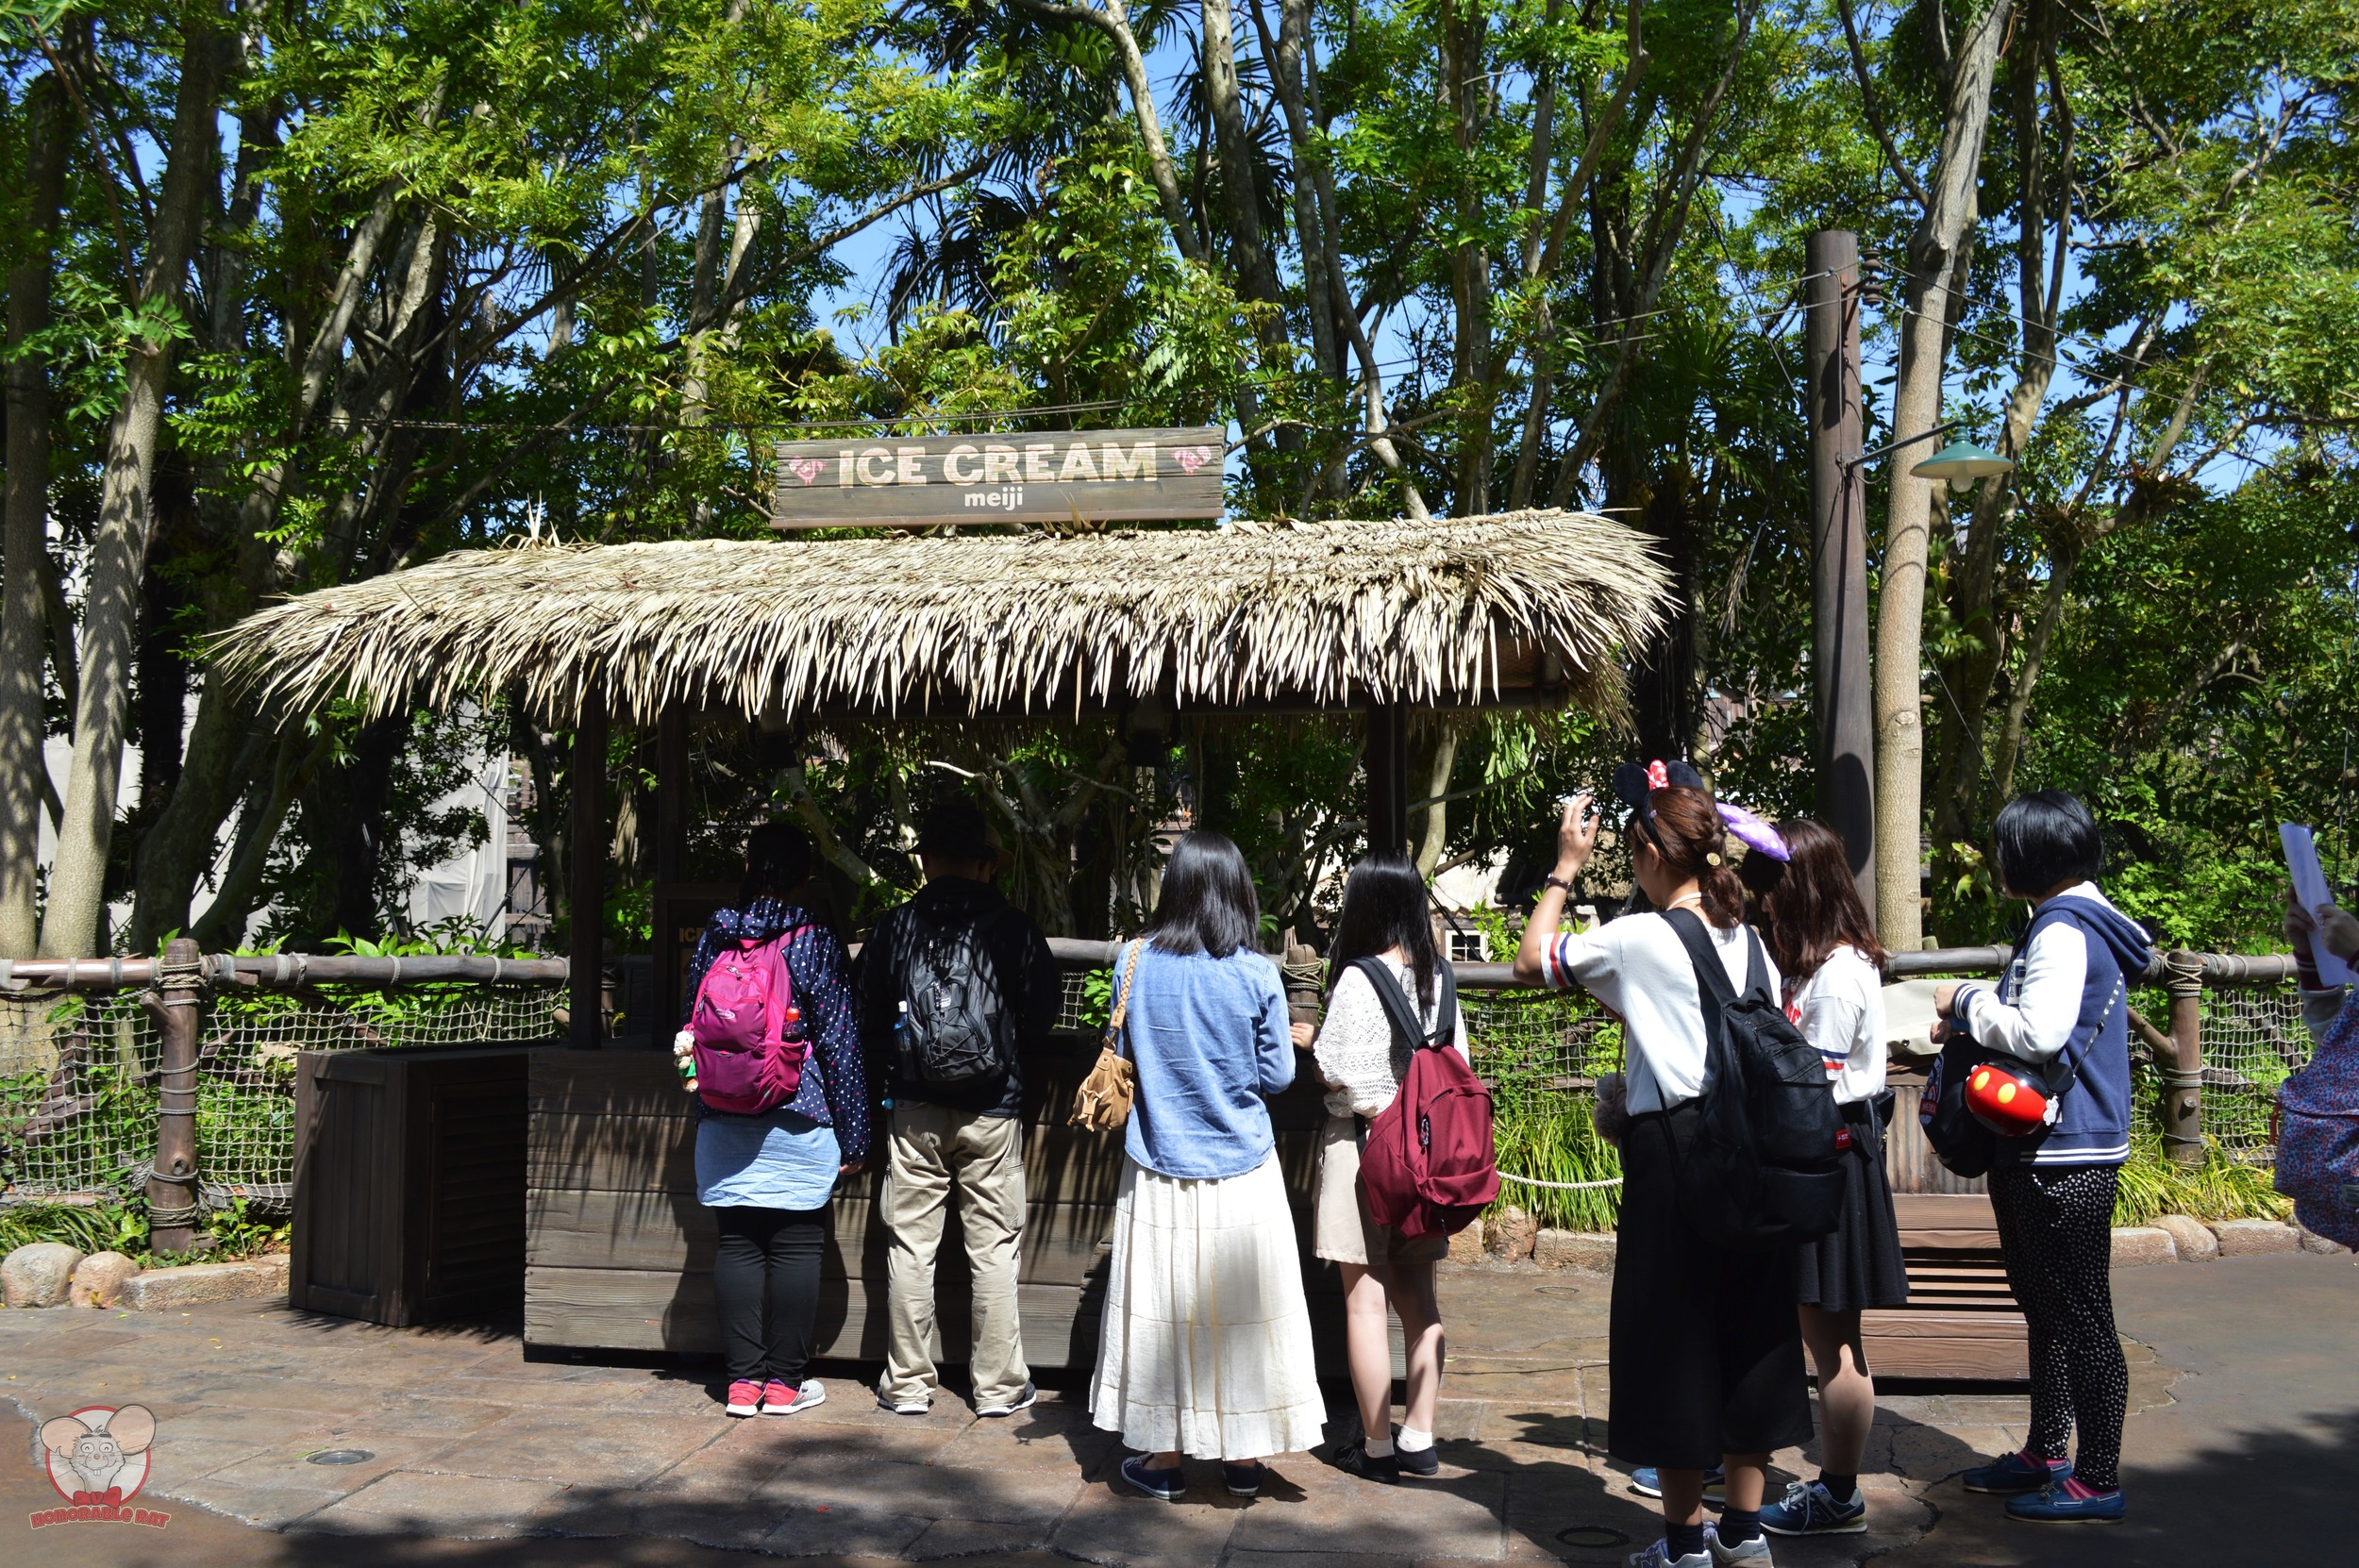 Ice Cream Stand in Tokyo Disneysea